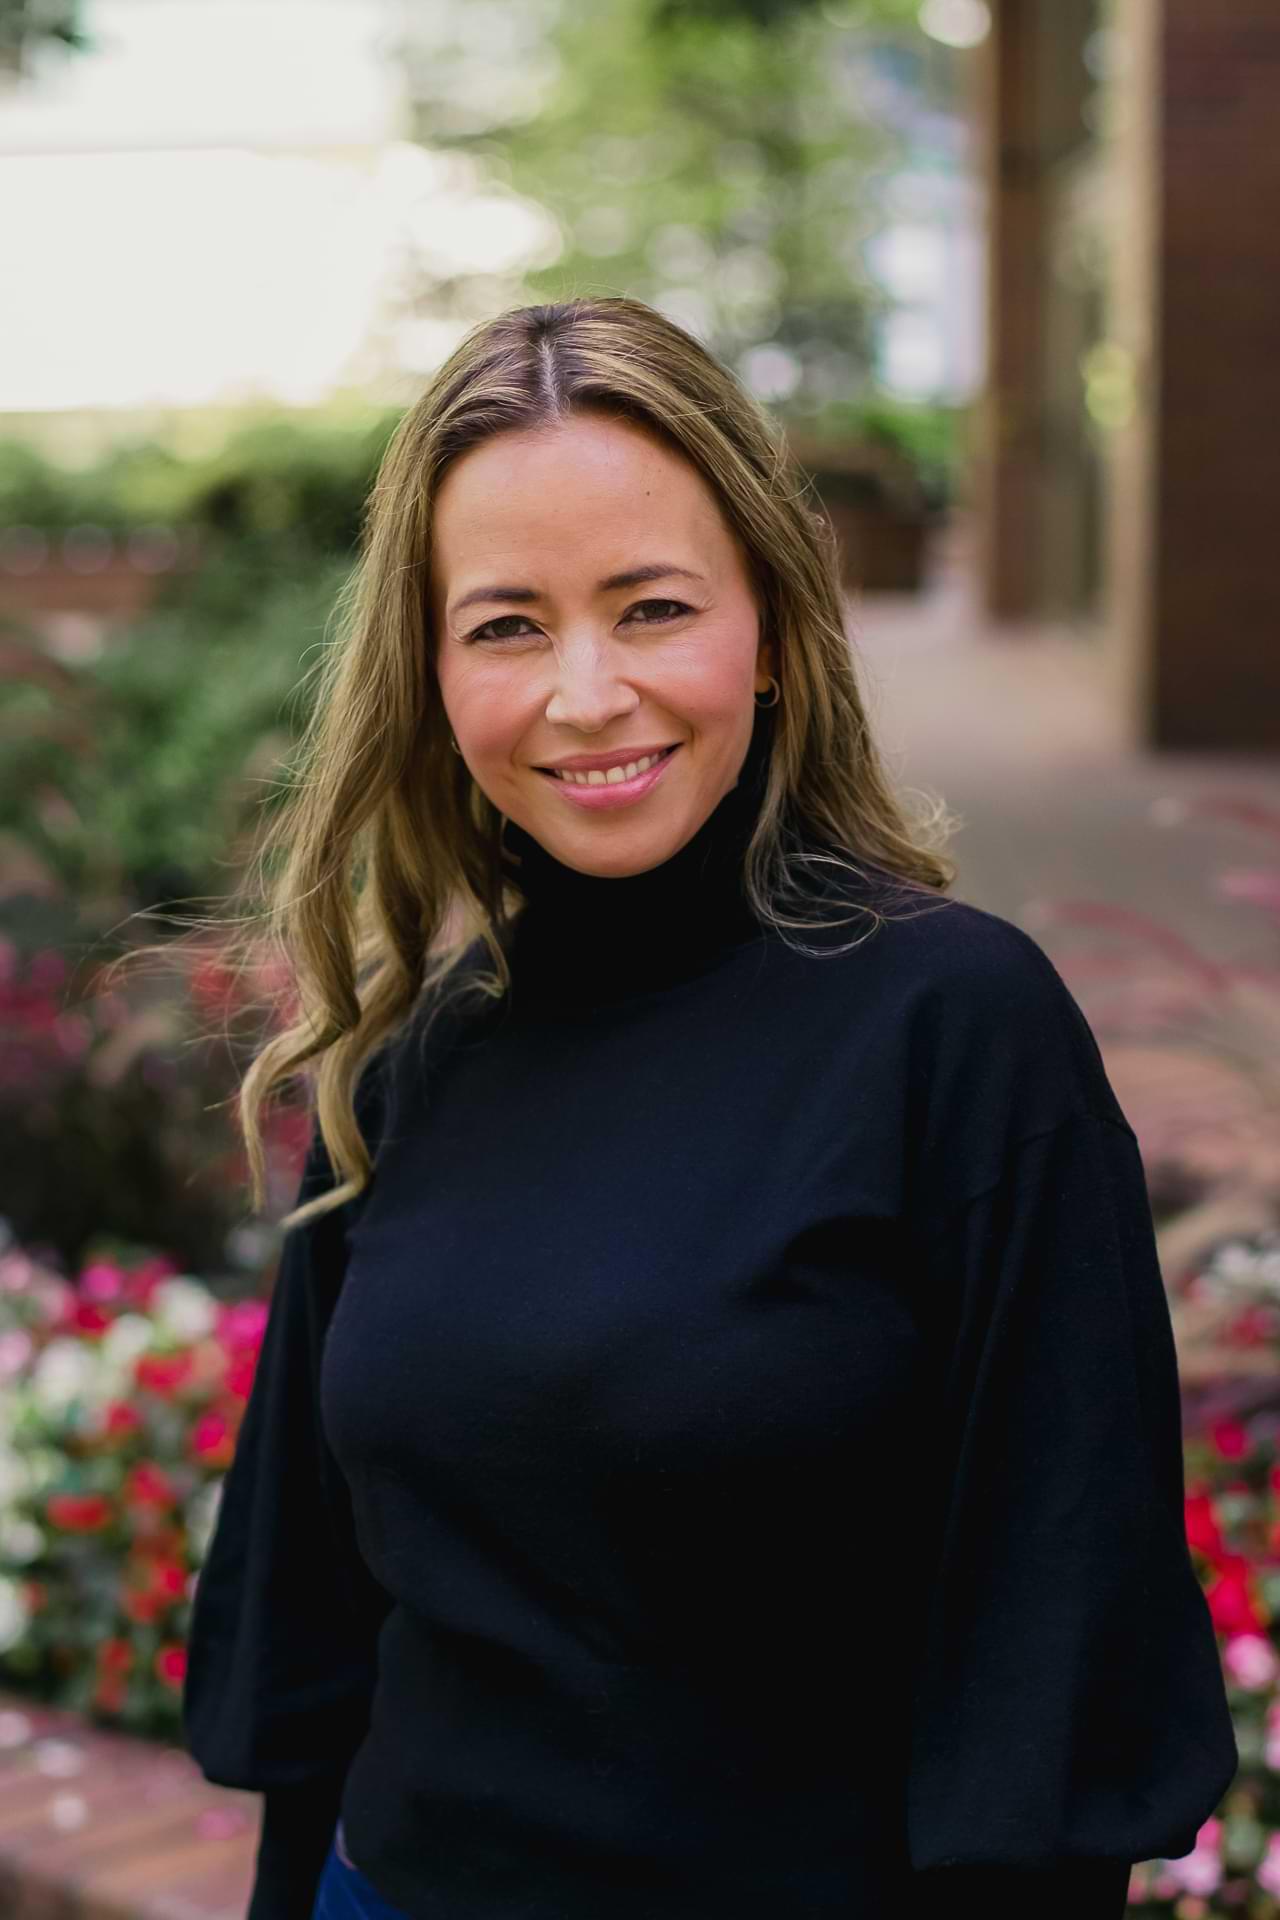 Portrait of Tara Haddad - CEO of Modern Foods Inc.